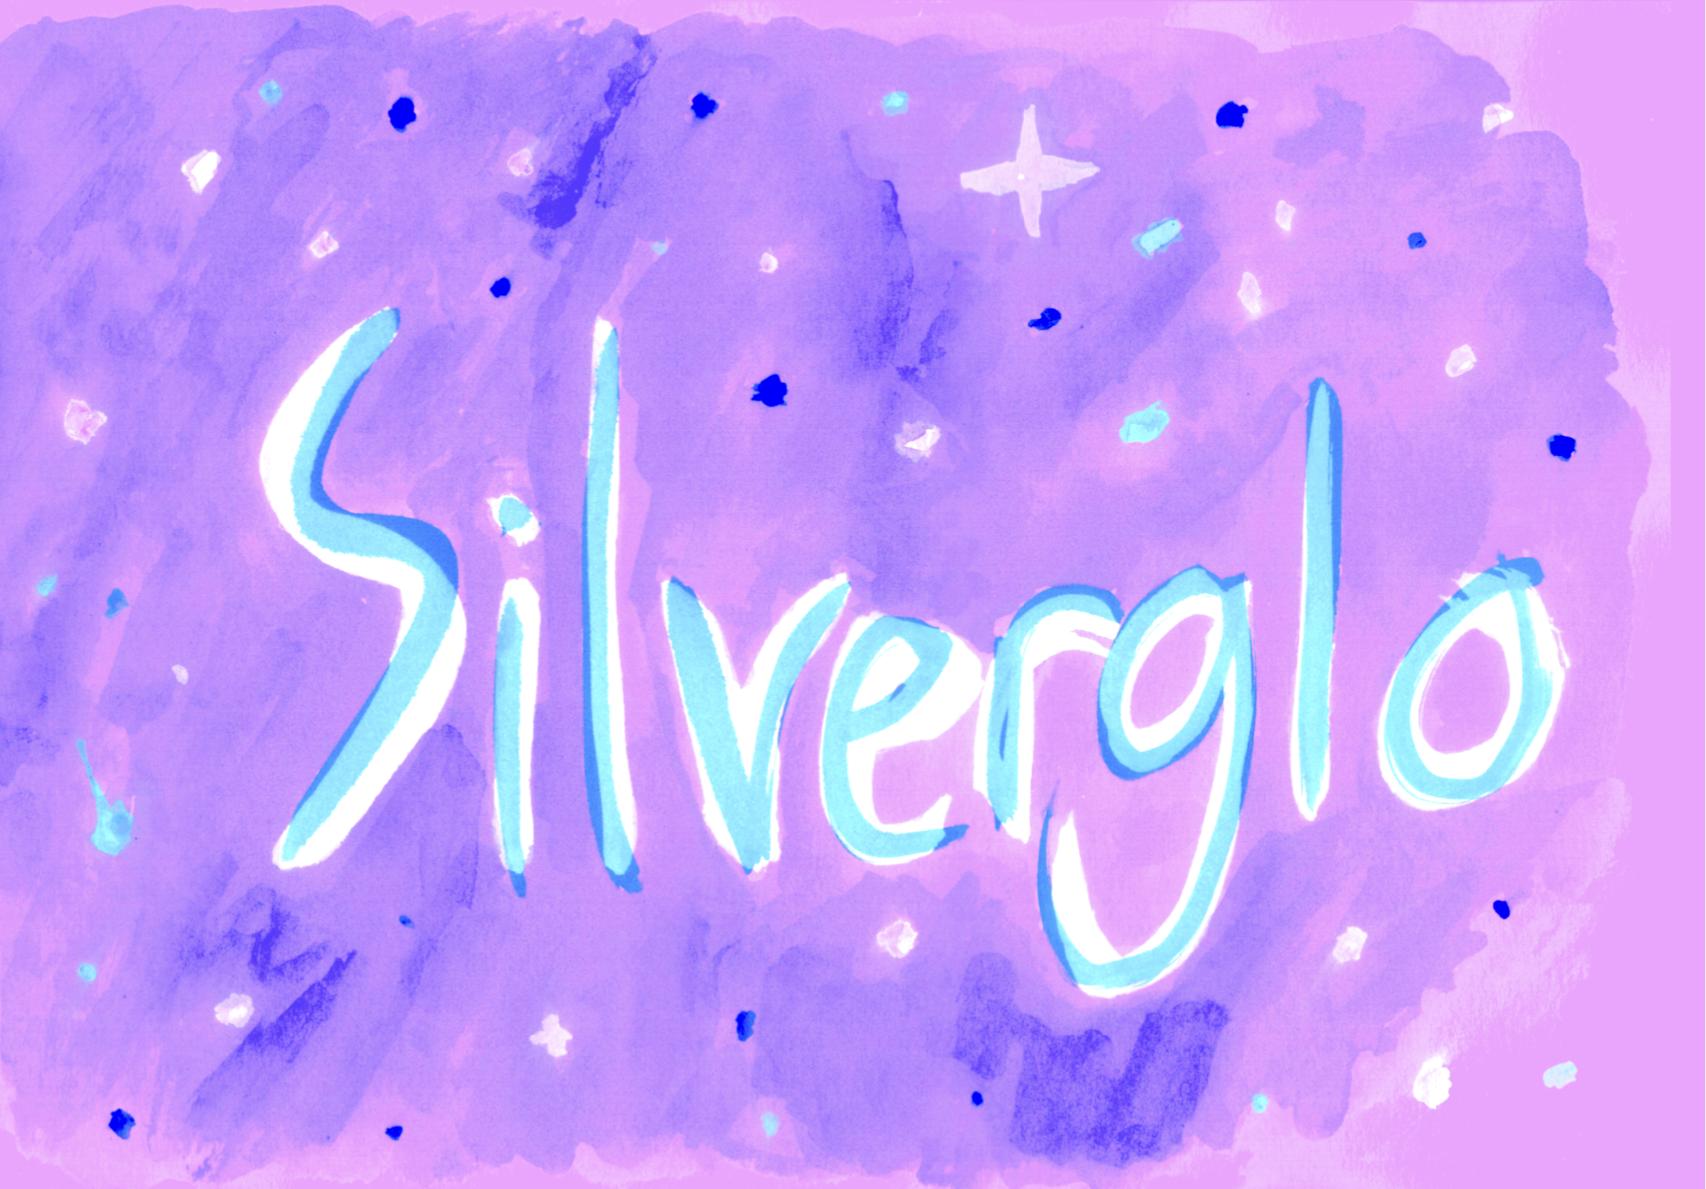 Silverglo Logo.png